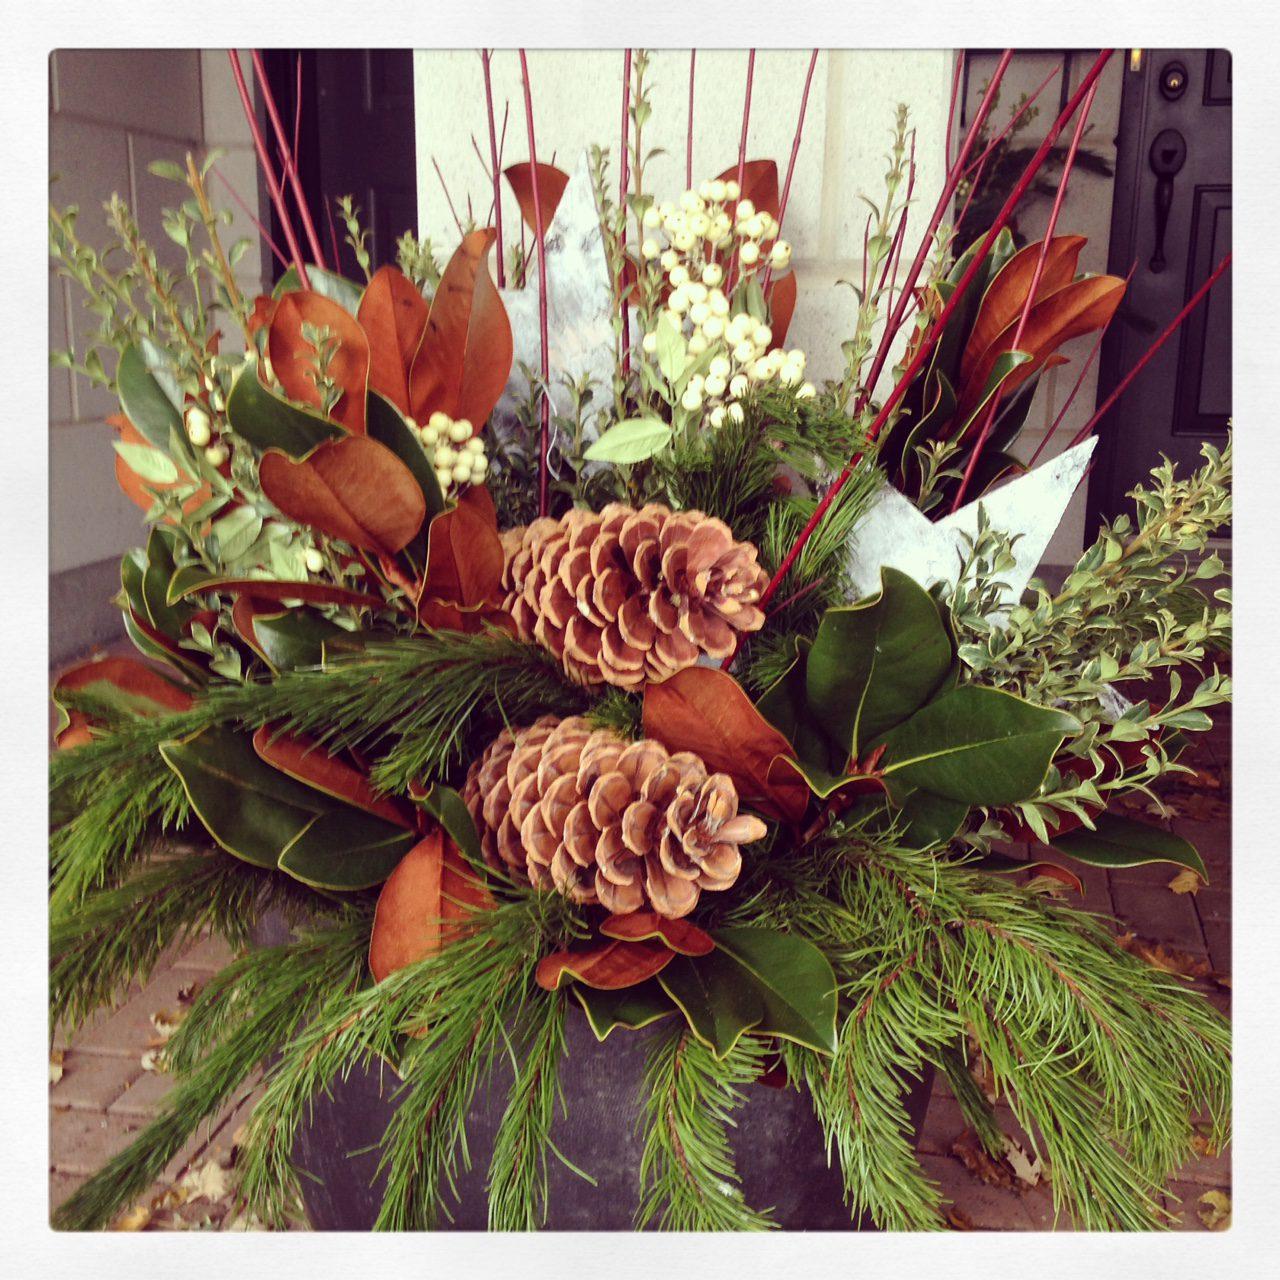 Winter evergreen urn arrangement